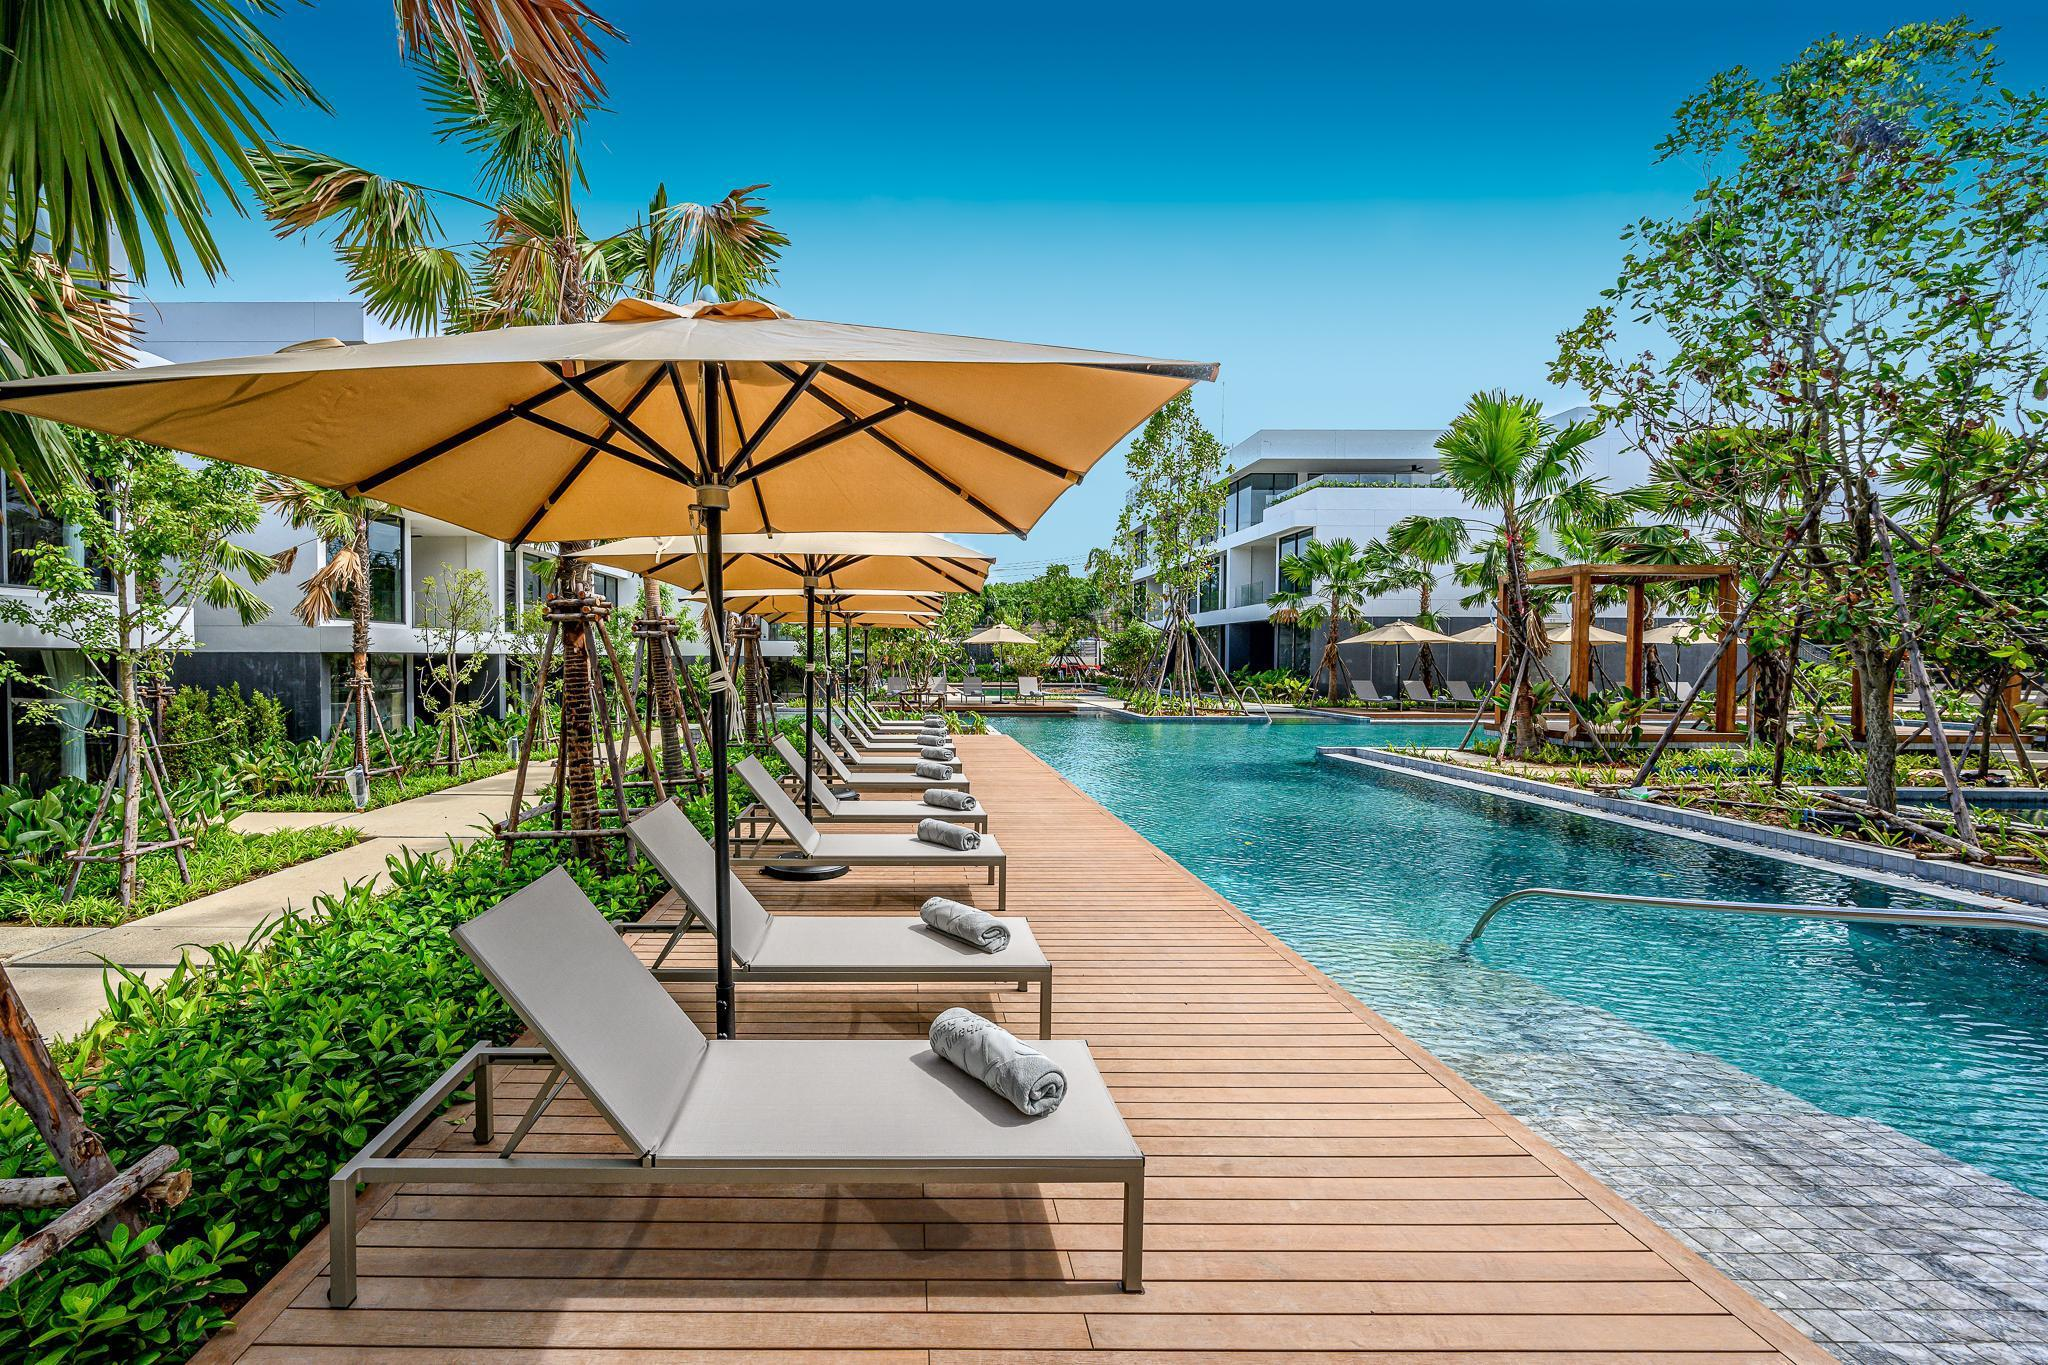 Stay Wellbeing & Lifestyle Resort สเตย์ เวลบีอิ้ง แอนด์ ไลฟ์สไตล์ รีสอร์ต